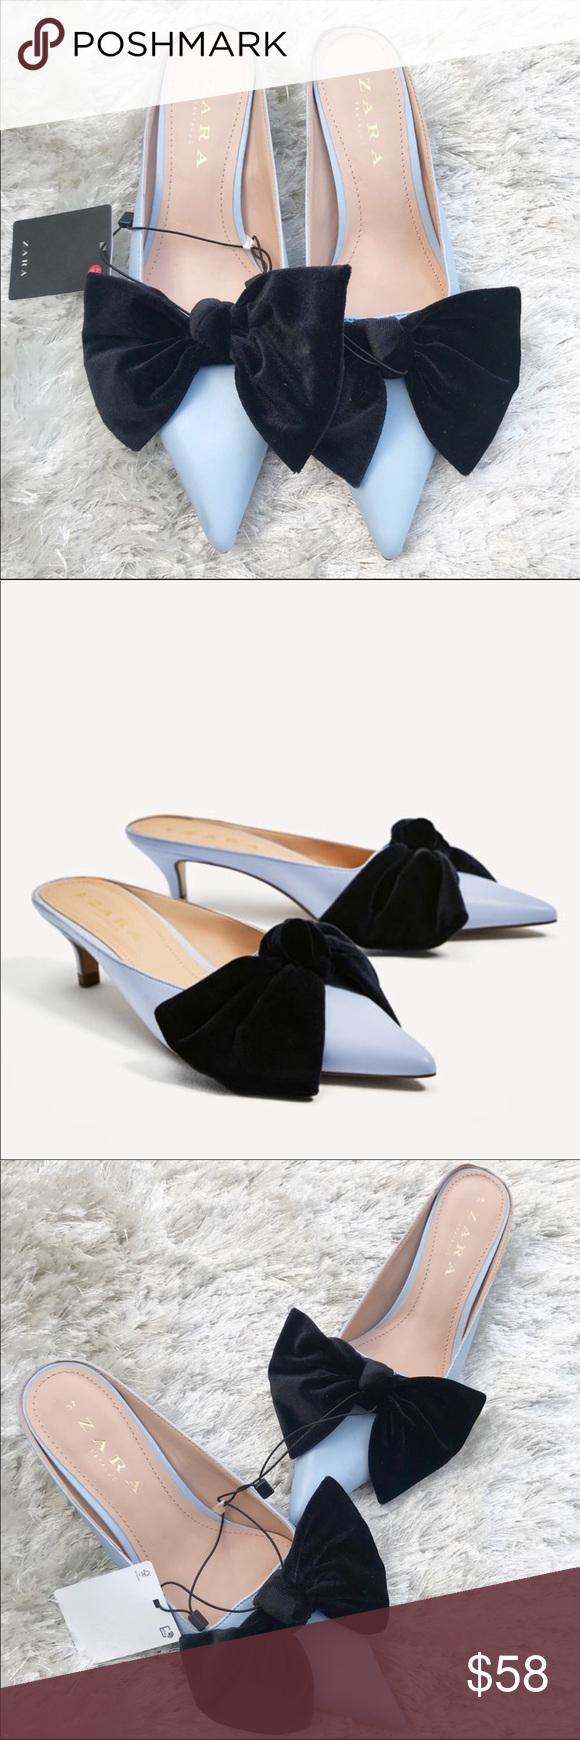 Nwt Zara Blue Heeled Mules With Velvet Bow Heeled Mules Blue High Heels Zara